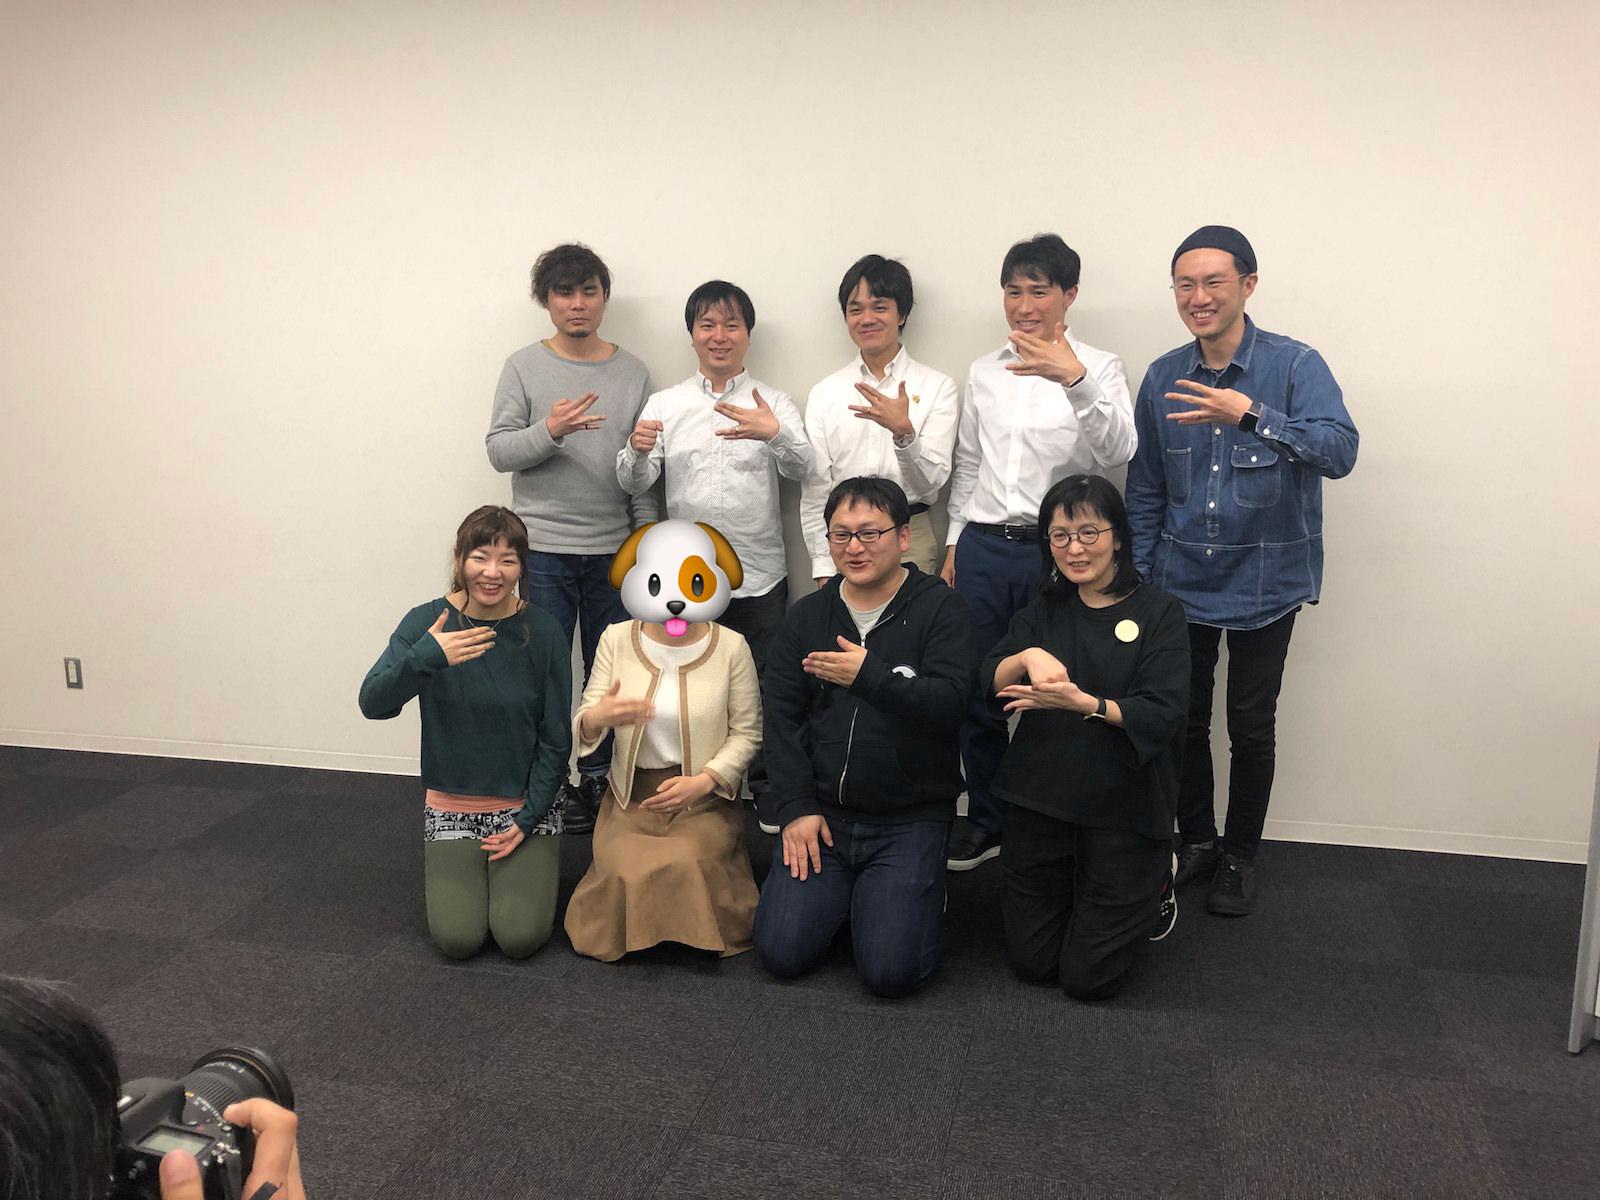 SaCSS Special21 10周年特大号参加レポート(後編)